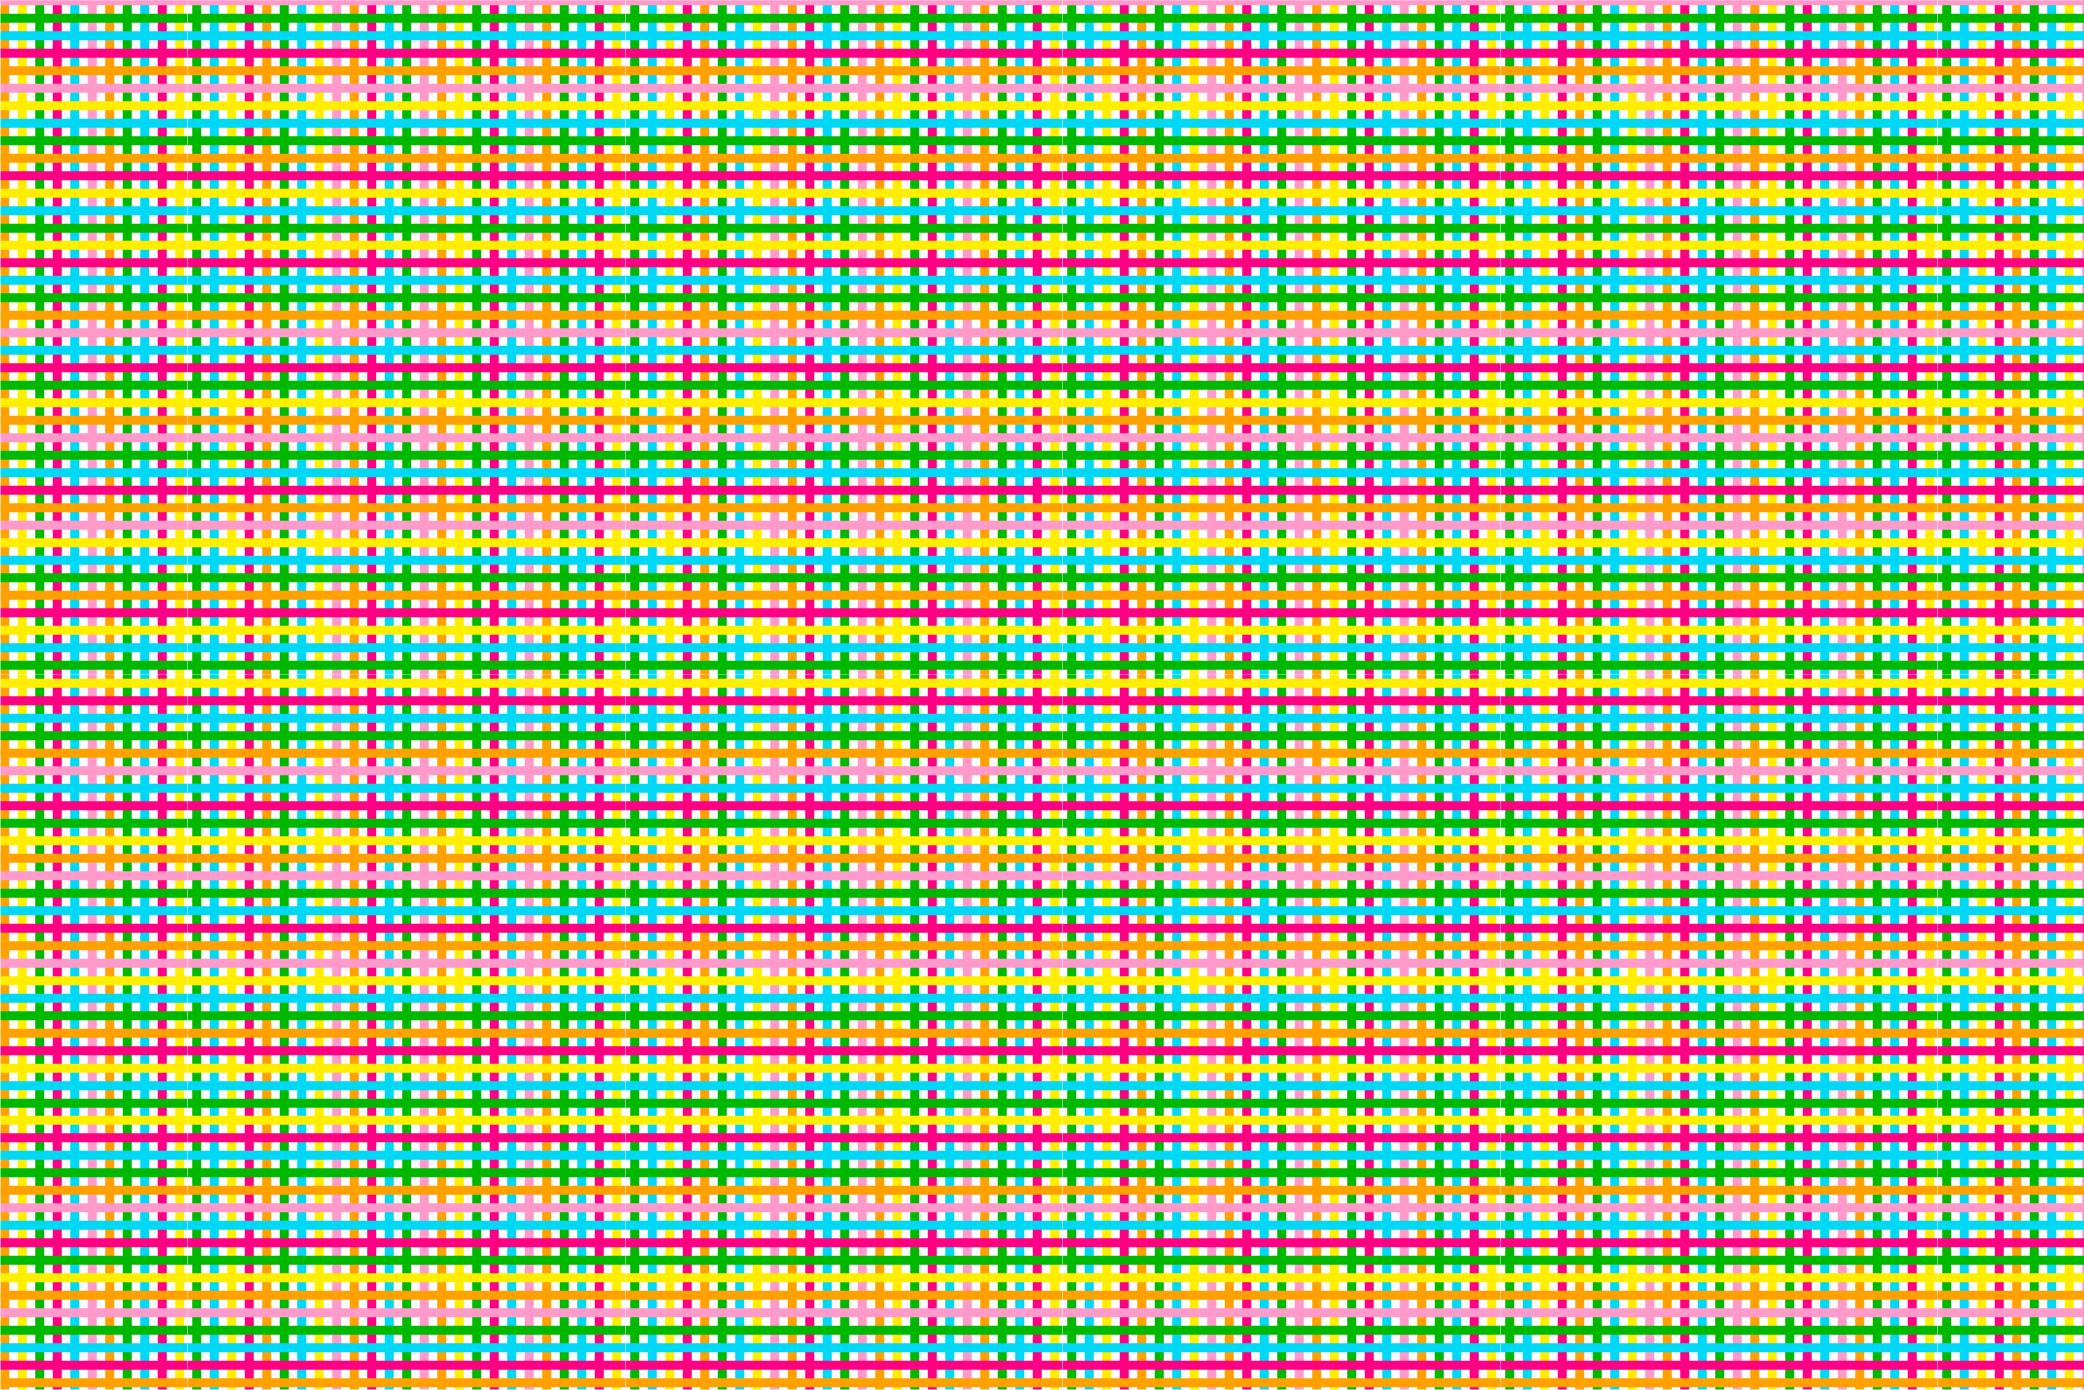 9 Geometric seamless patterns. Ai, EPS, JPG, SVG example image 9